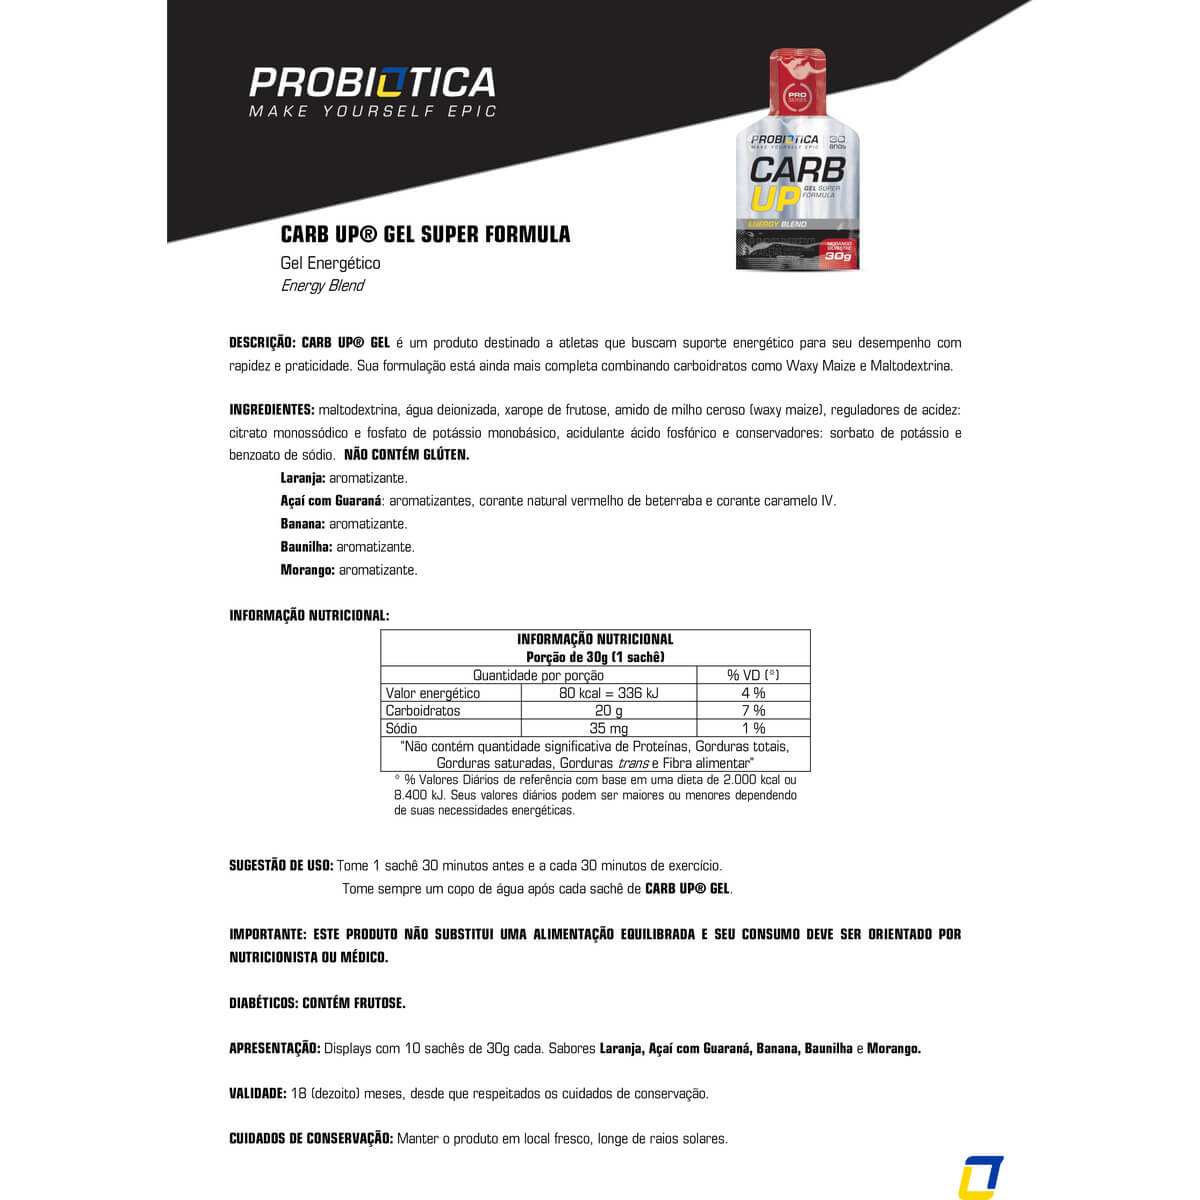 CARB-UP GEL BLACK (DISPLAY - 10 SACHES) PROBIOTICA